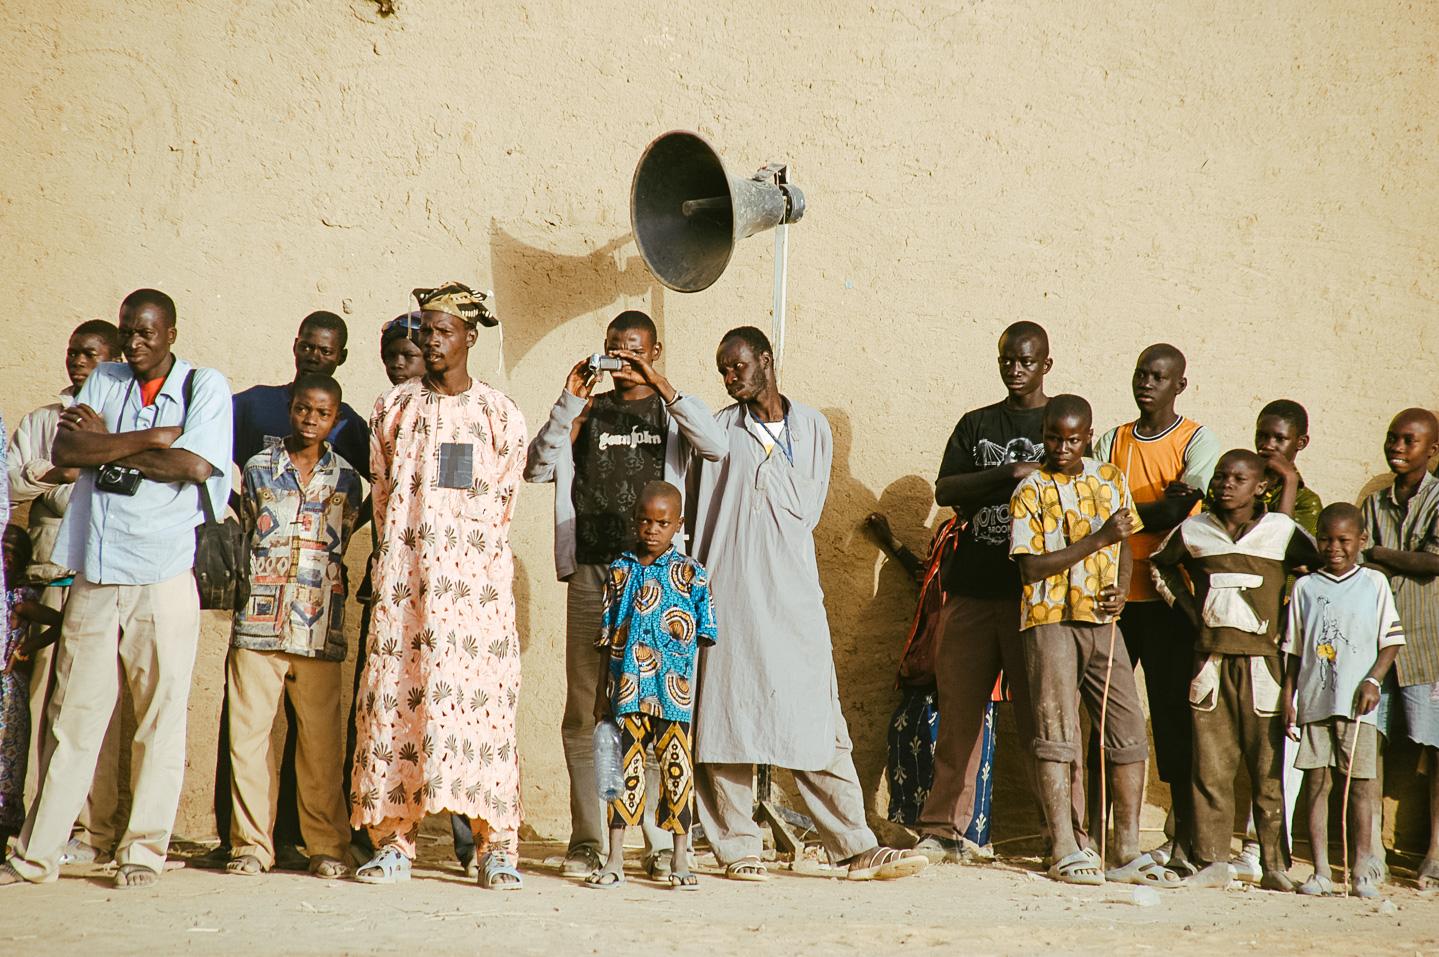 Rund um Afrika - Mali - Westafrika - Transafrika-433